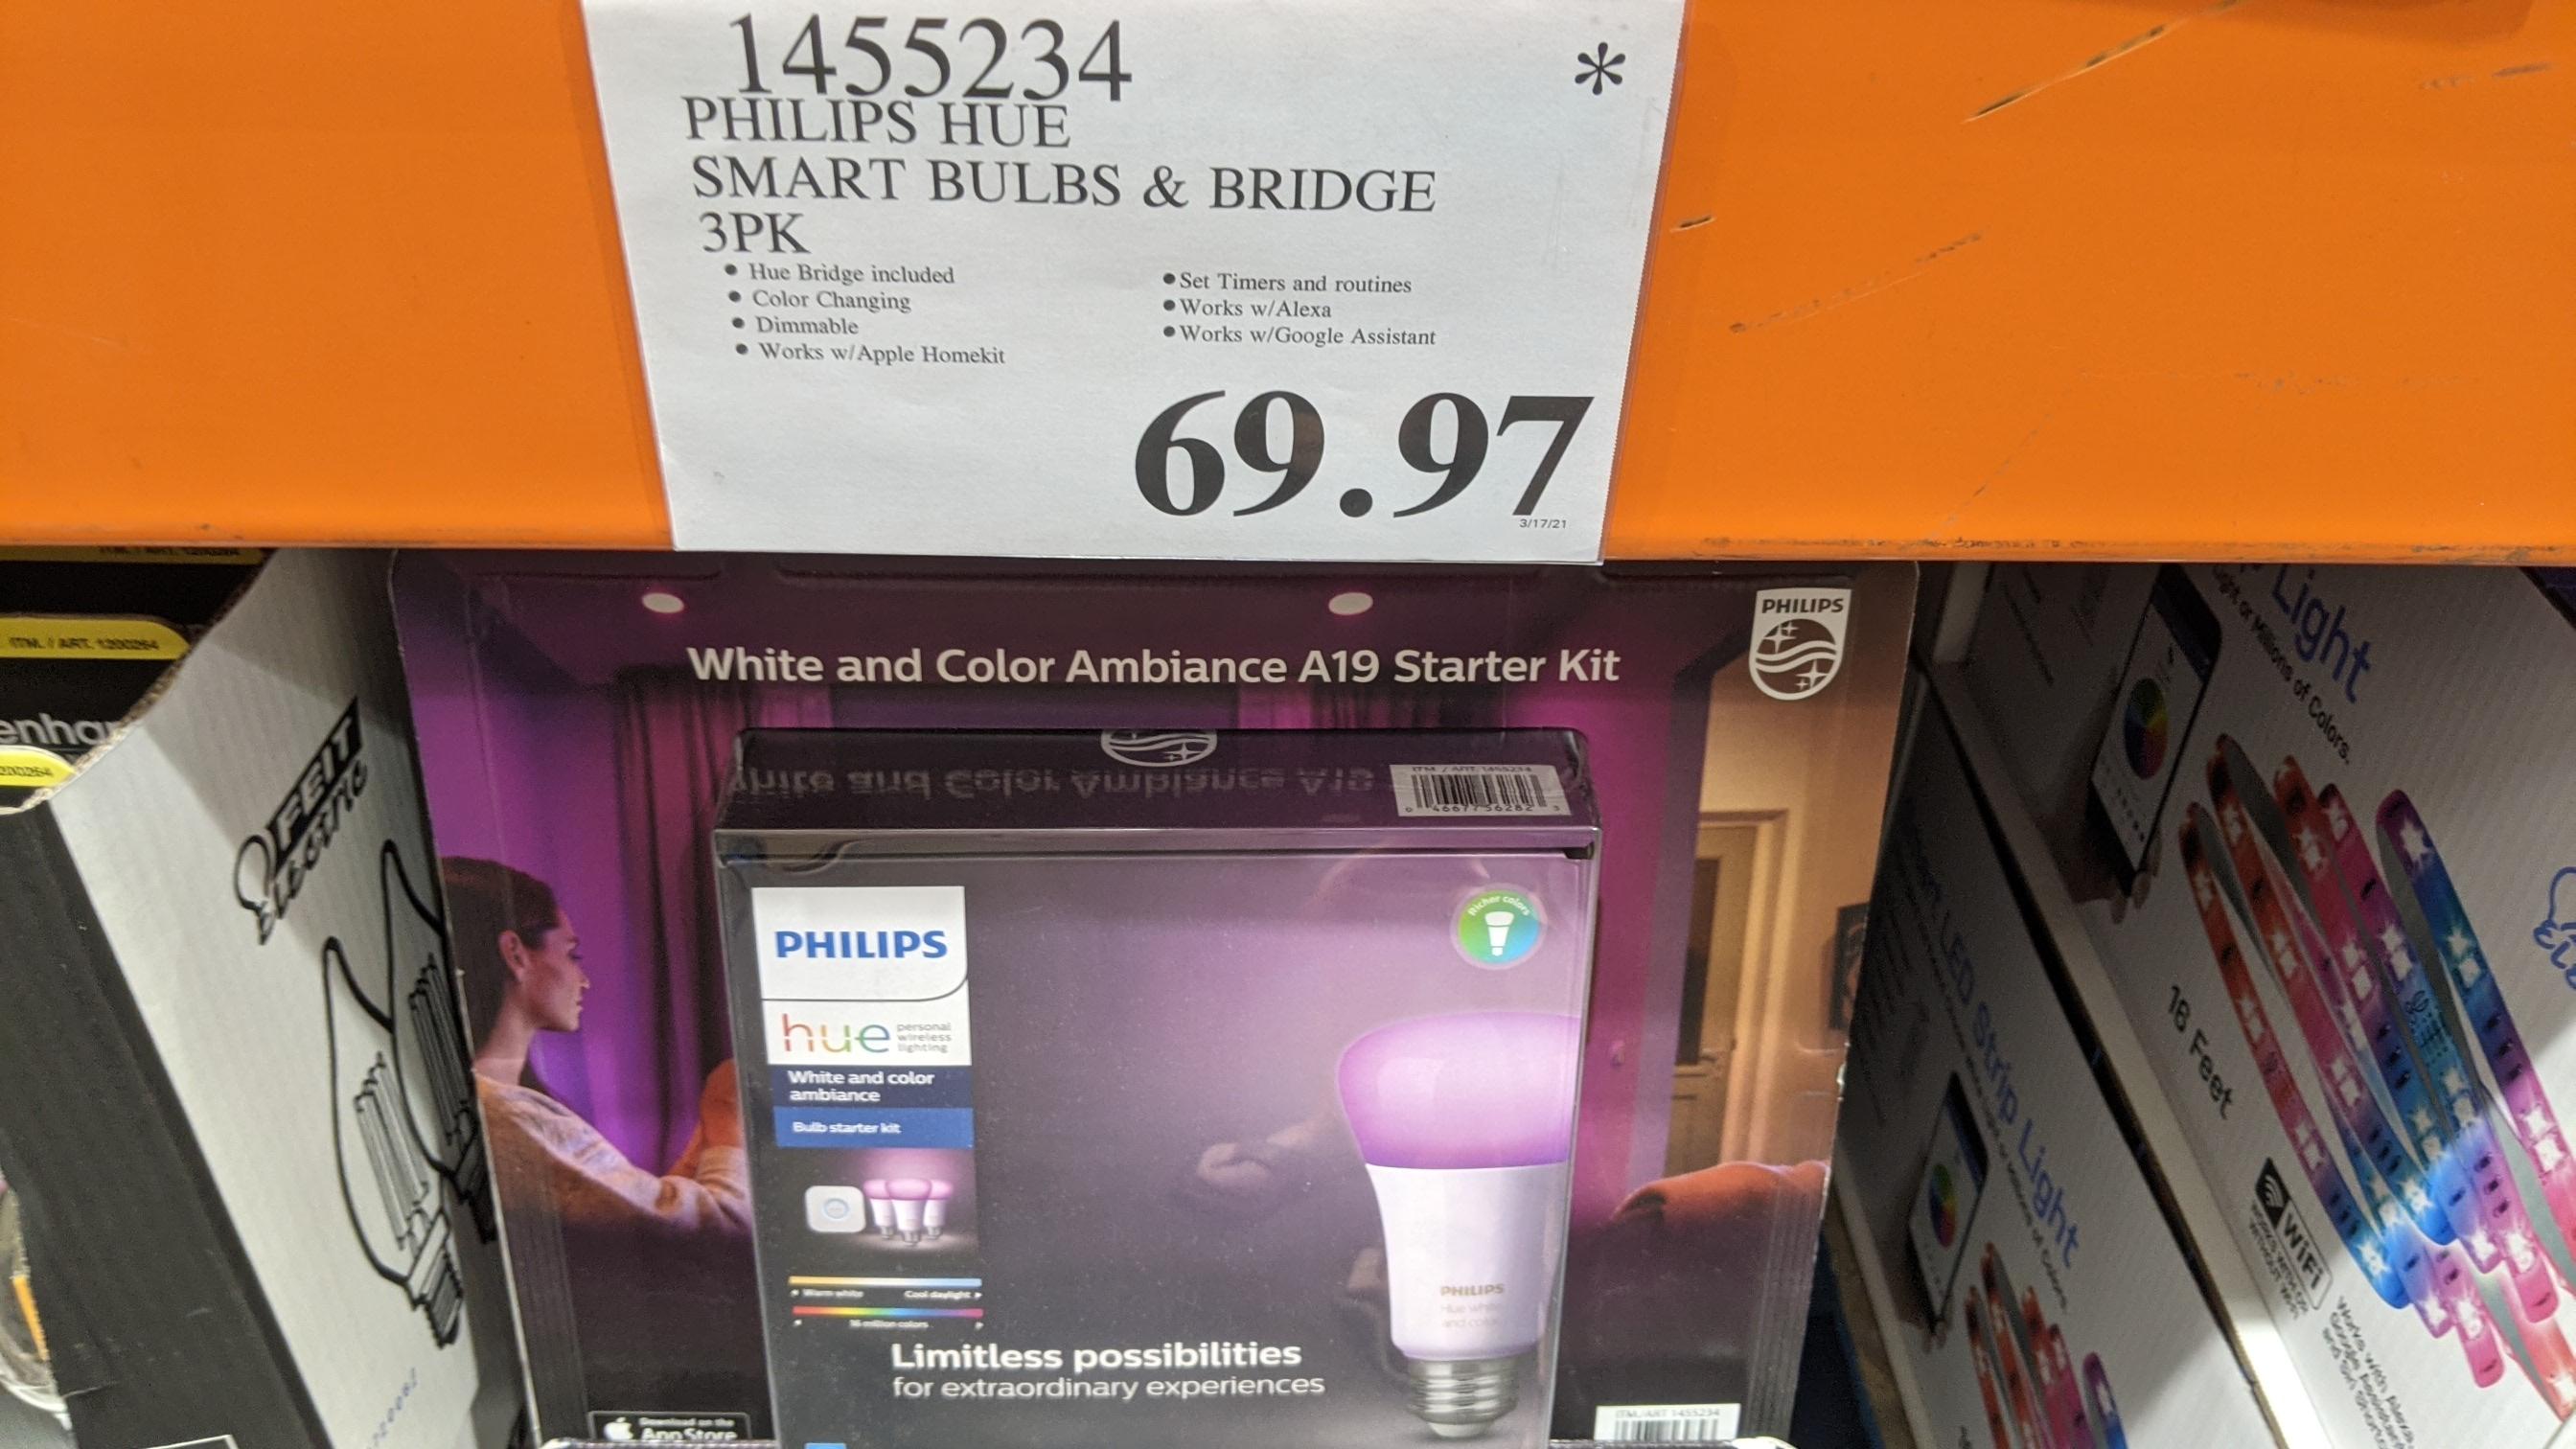 Phillips Hue starter kit (3 bulbs and bridge) $69 YMMV - In store only